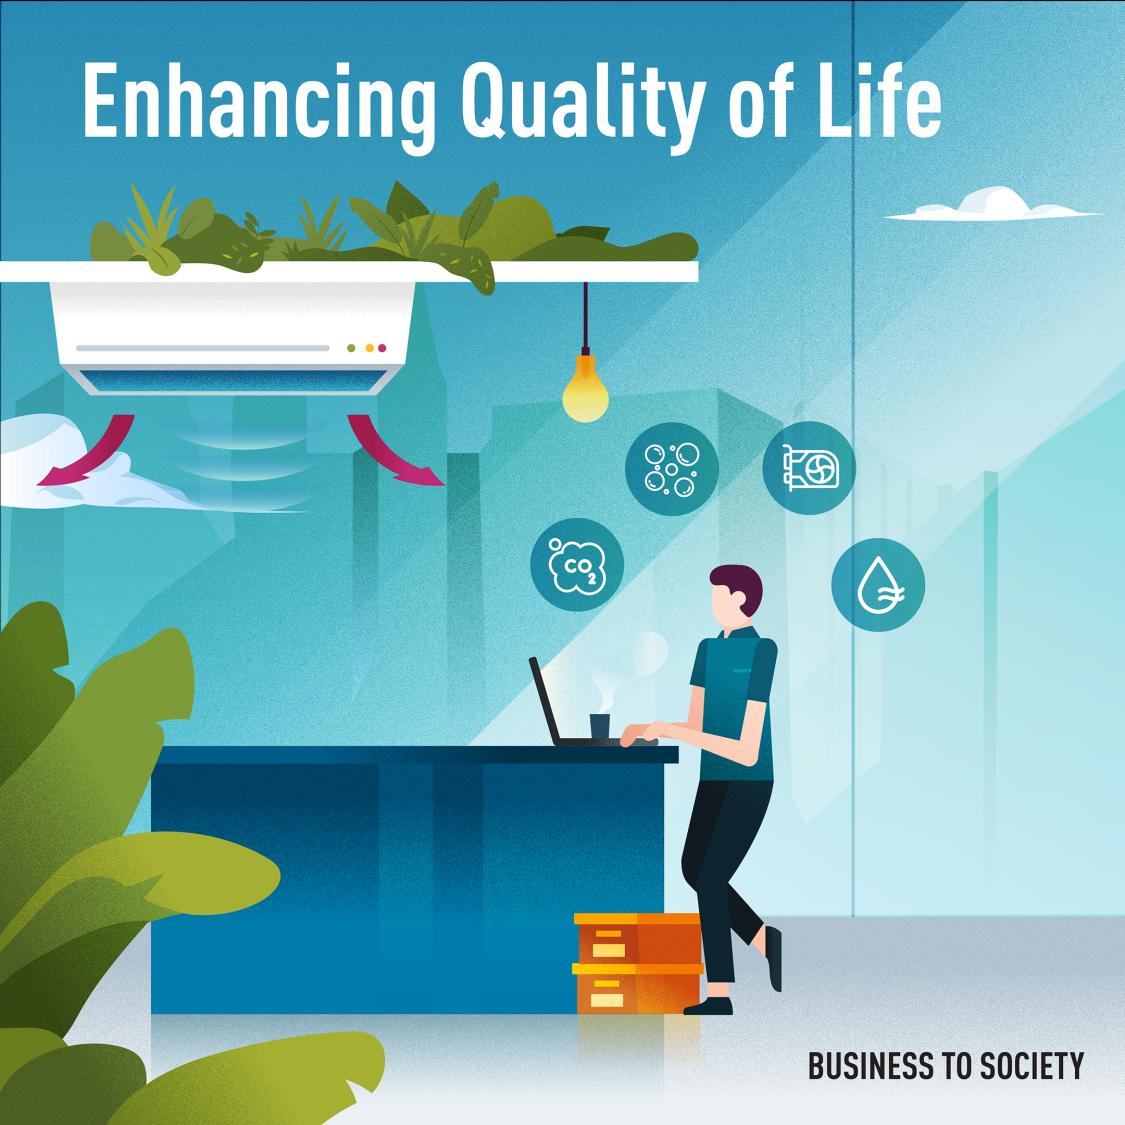 Enhancing quality of life